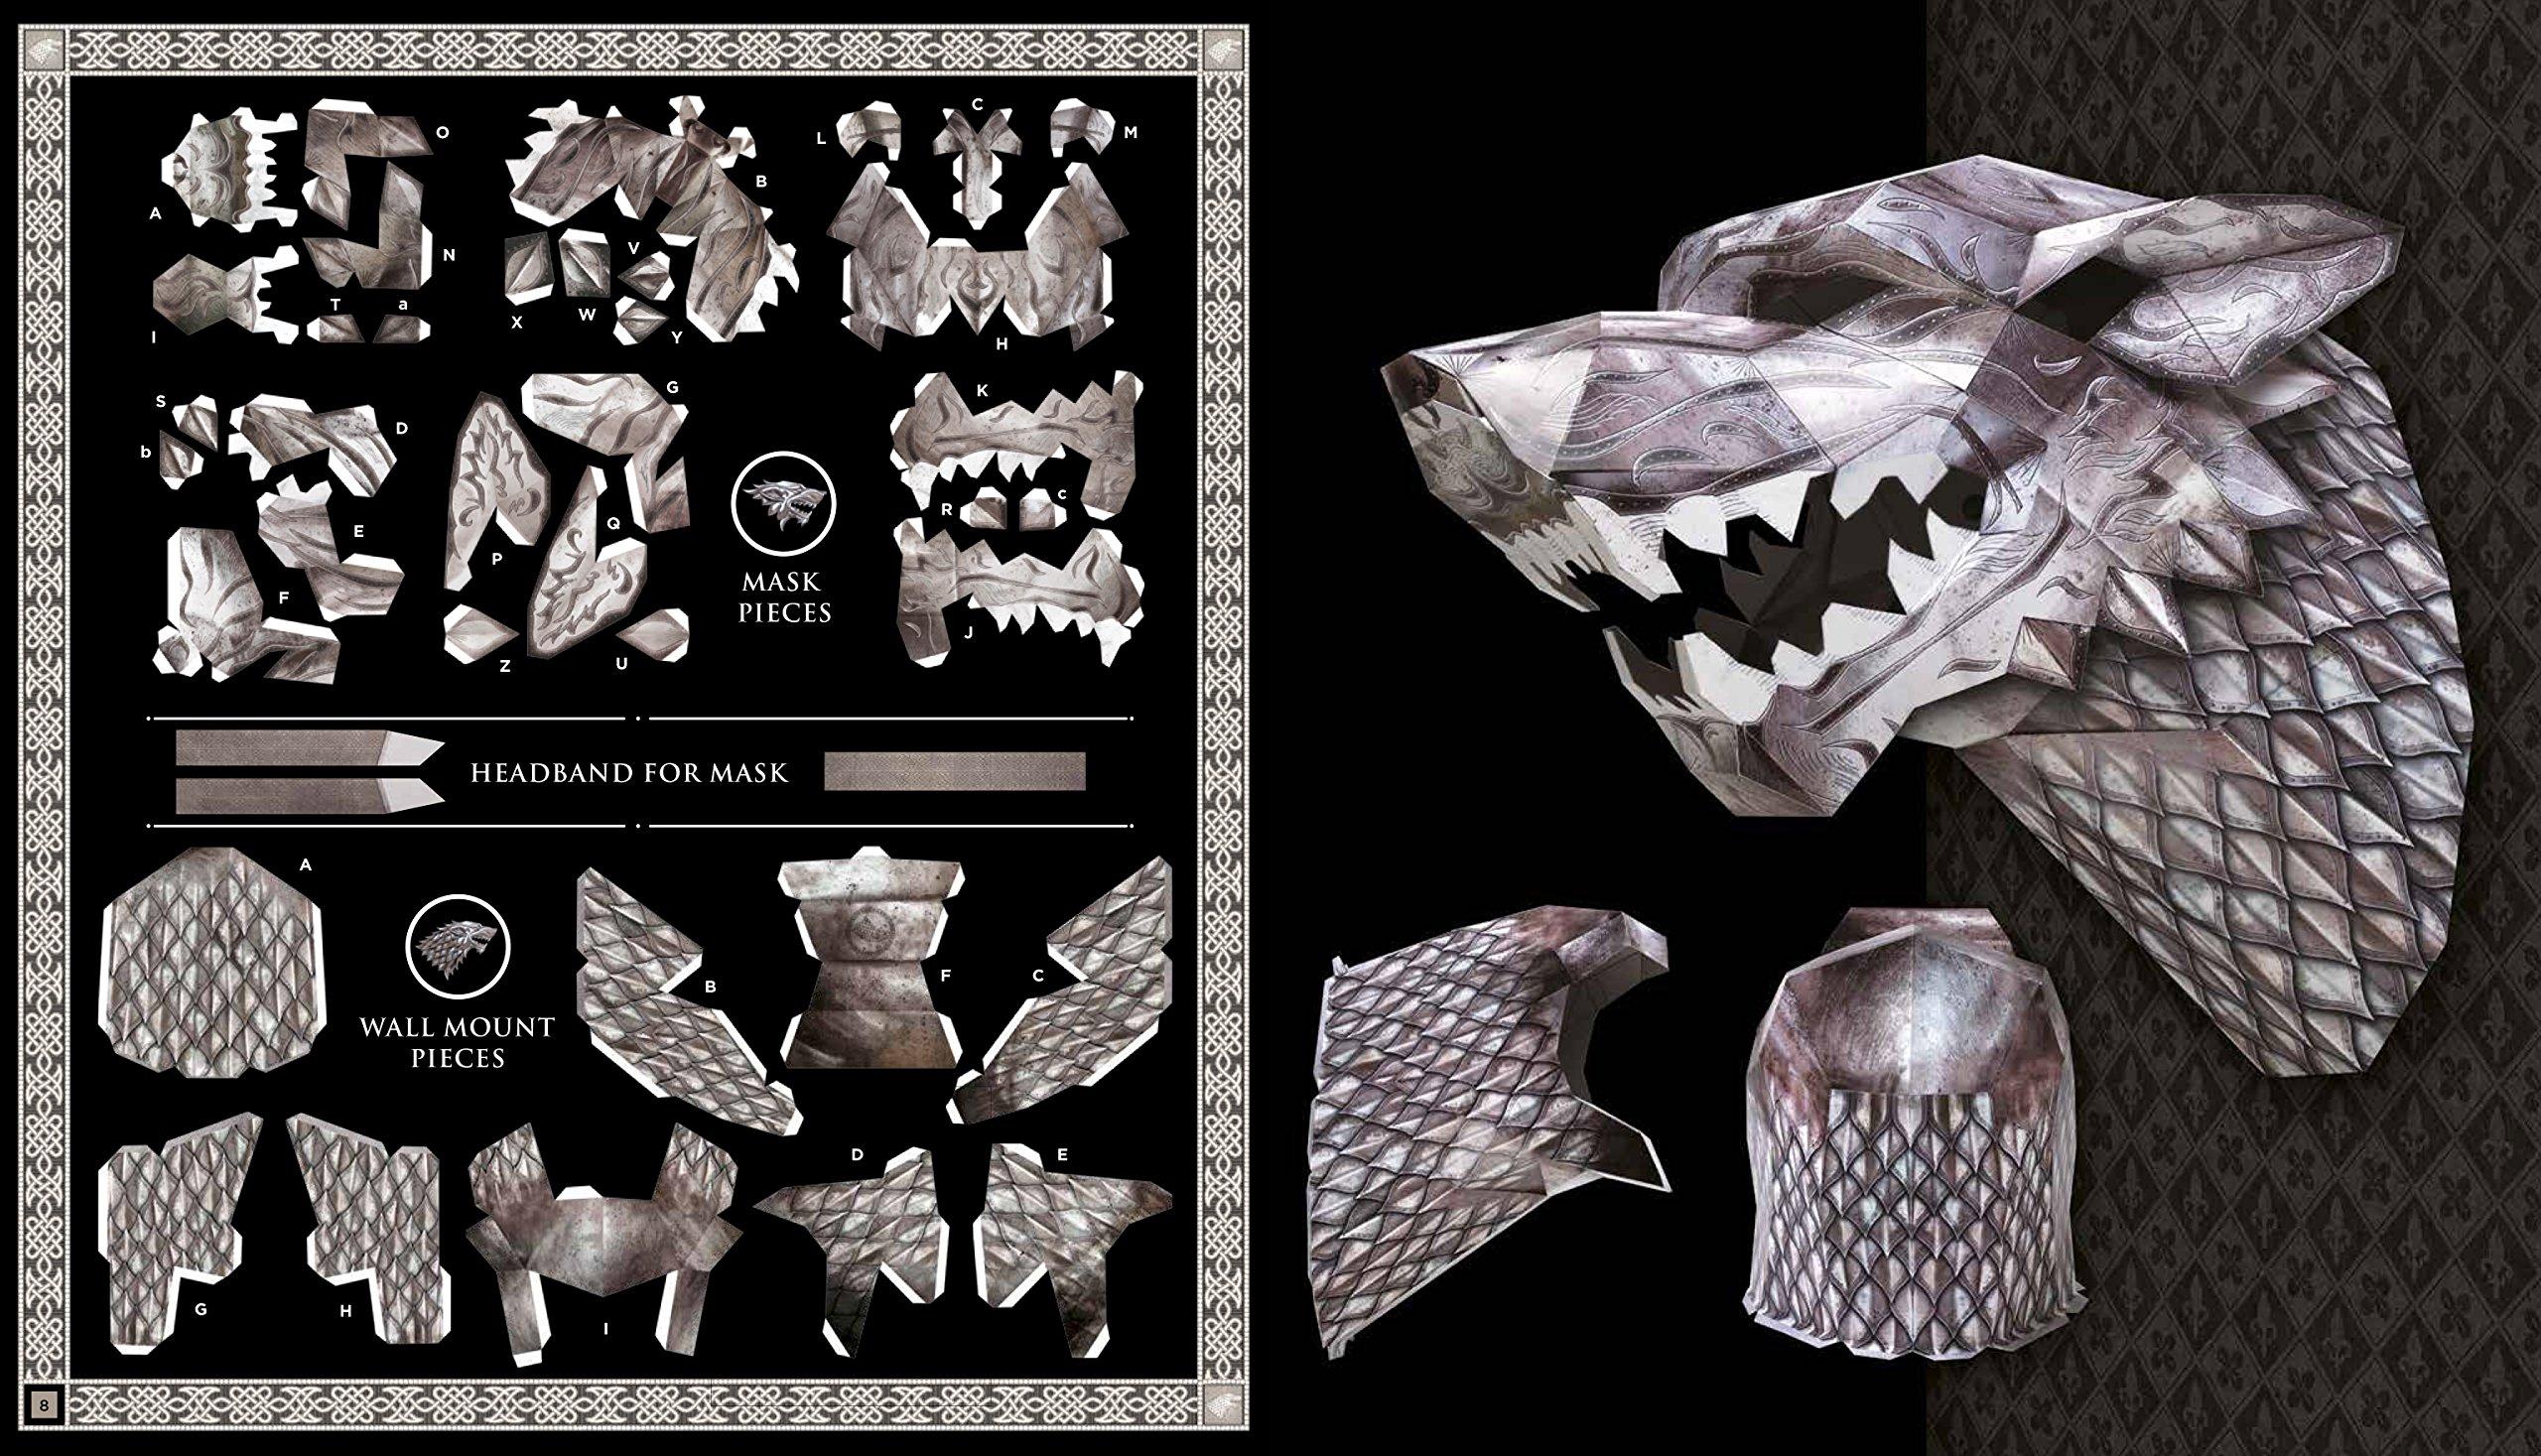 Game Of Thrones. The House Stark Direwolf: Amazon.es: Vv.Aa: Libros en idiomas extranjeros